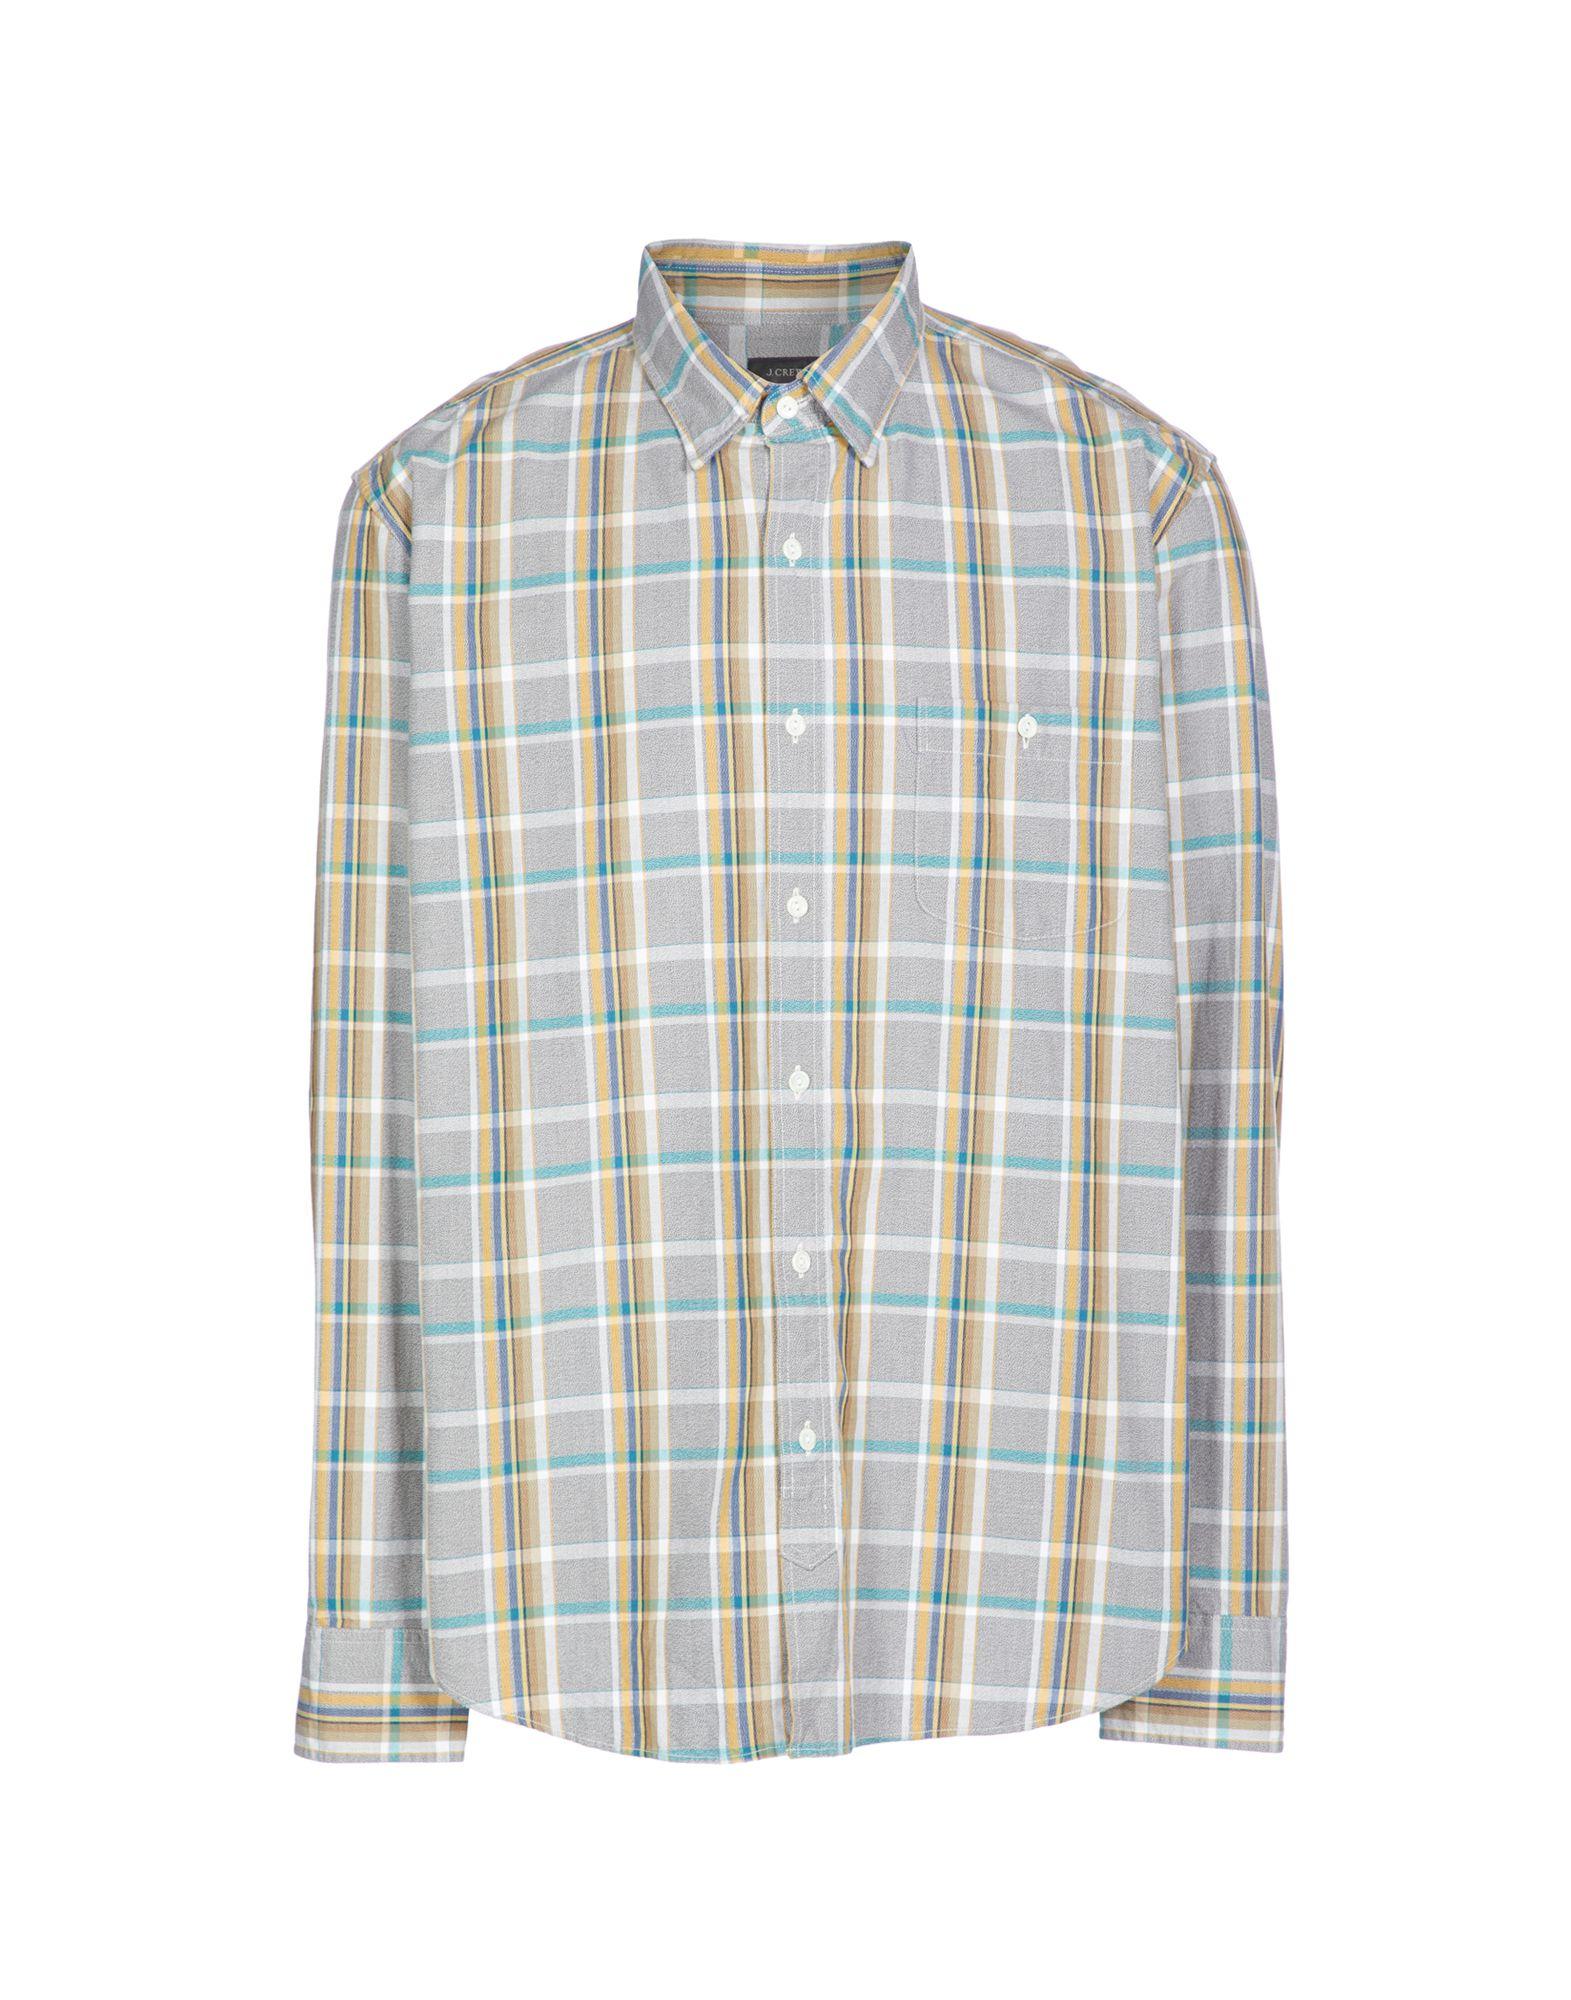 J.CREW Shirts. plain weave, long sleeves, button-down collar, no appliqués, checked, single chest pocket. 100% Cotton